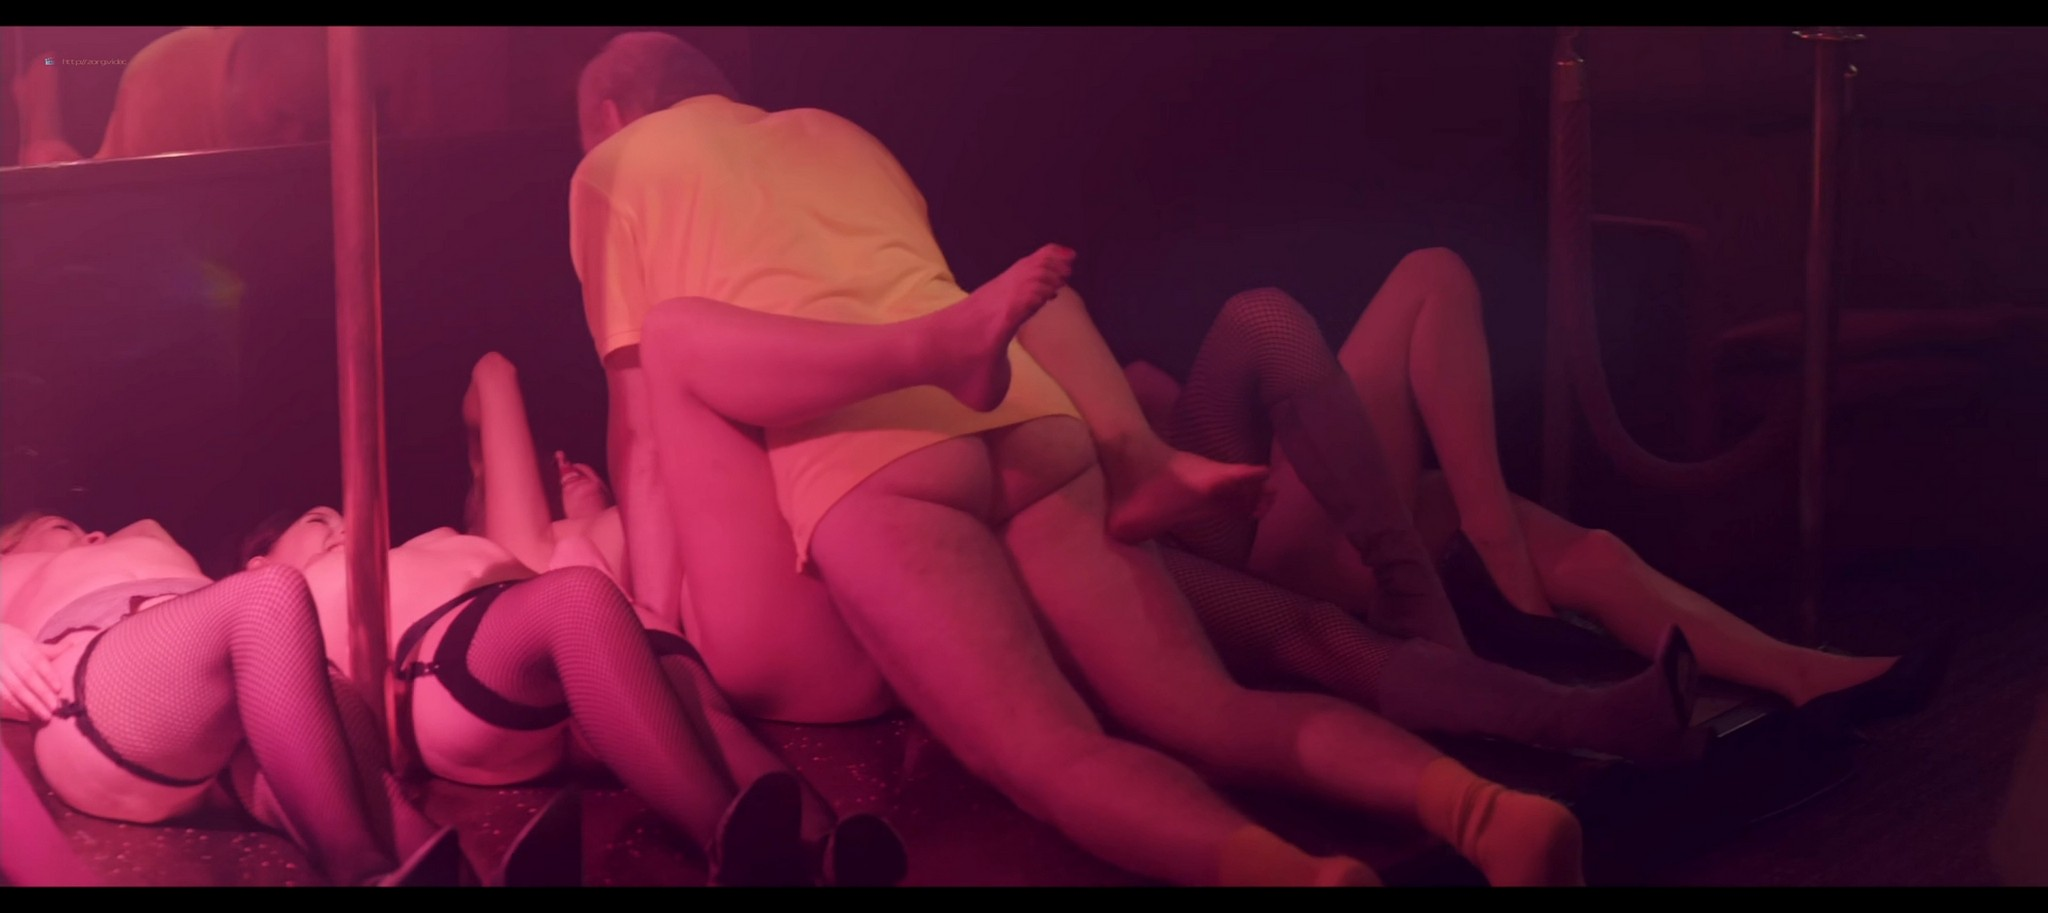 Camilla Cornelia Lehmann nude Sarahsita Lassen, nude and explicit body parts - Spies Og Glistrup (DK-2013) HD 1080p BluRay (14)